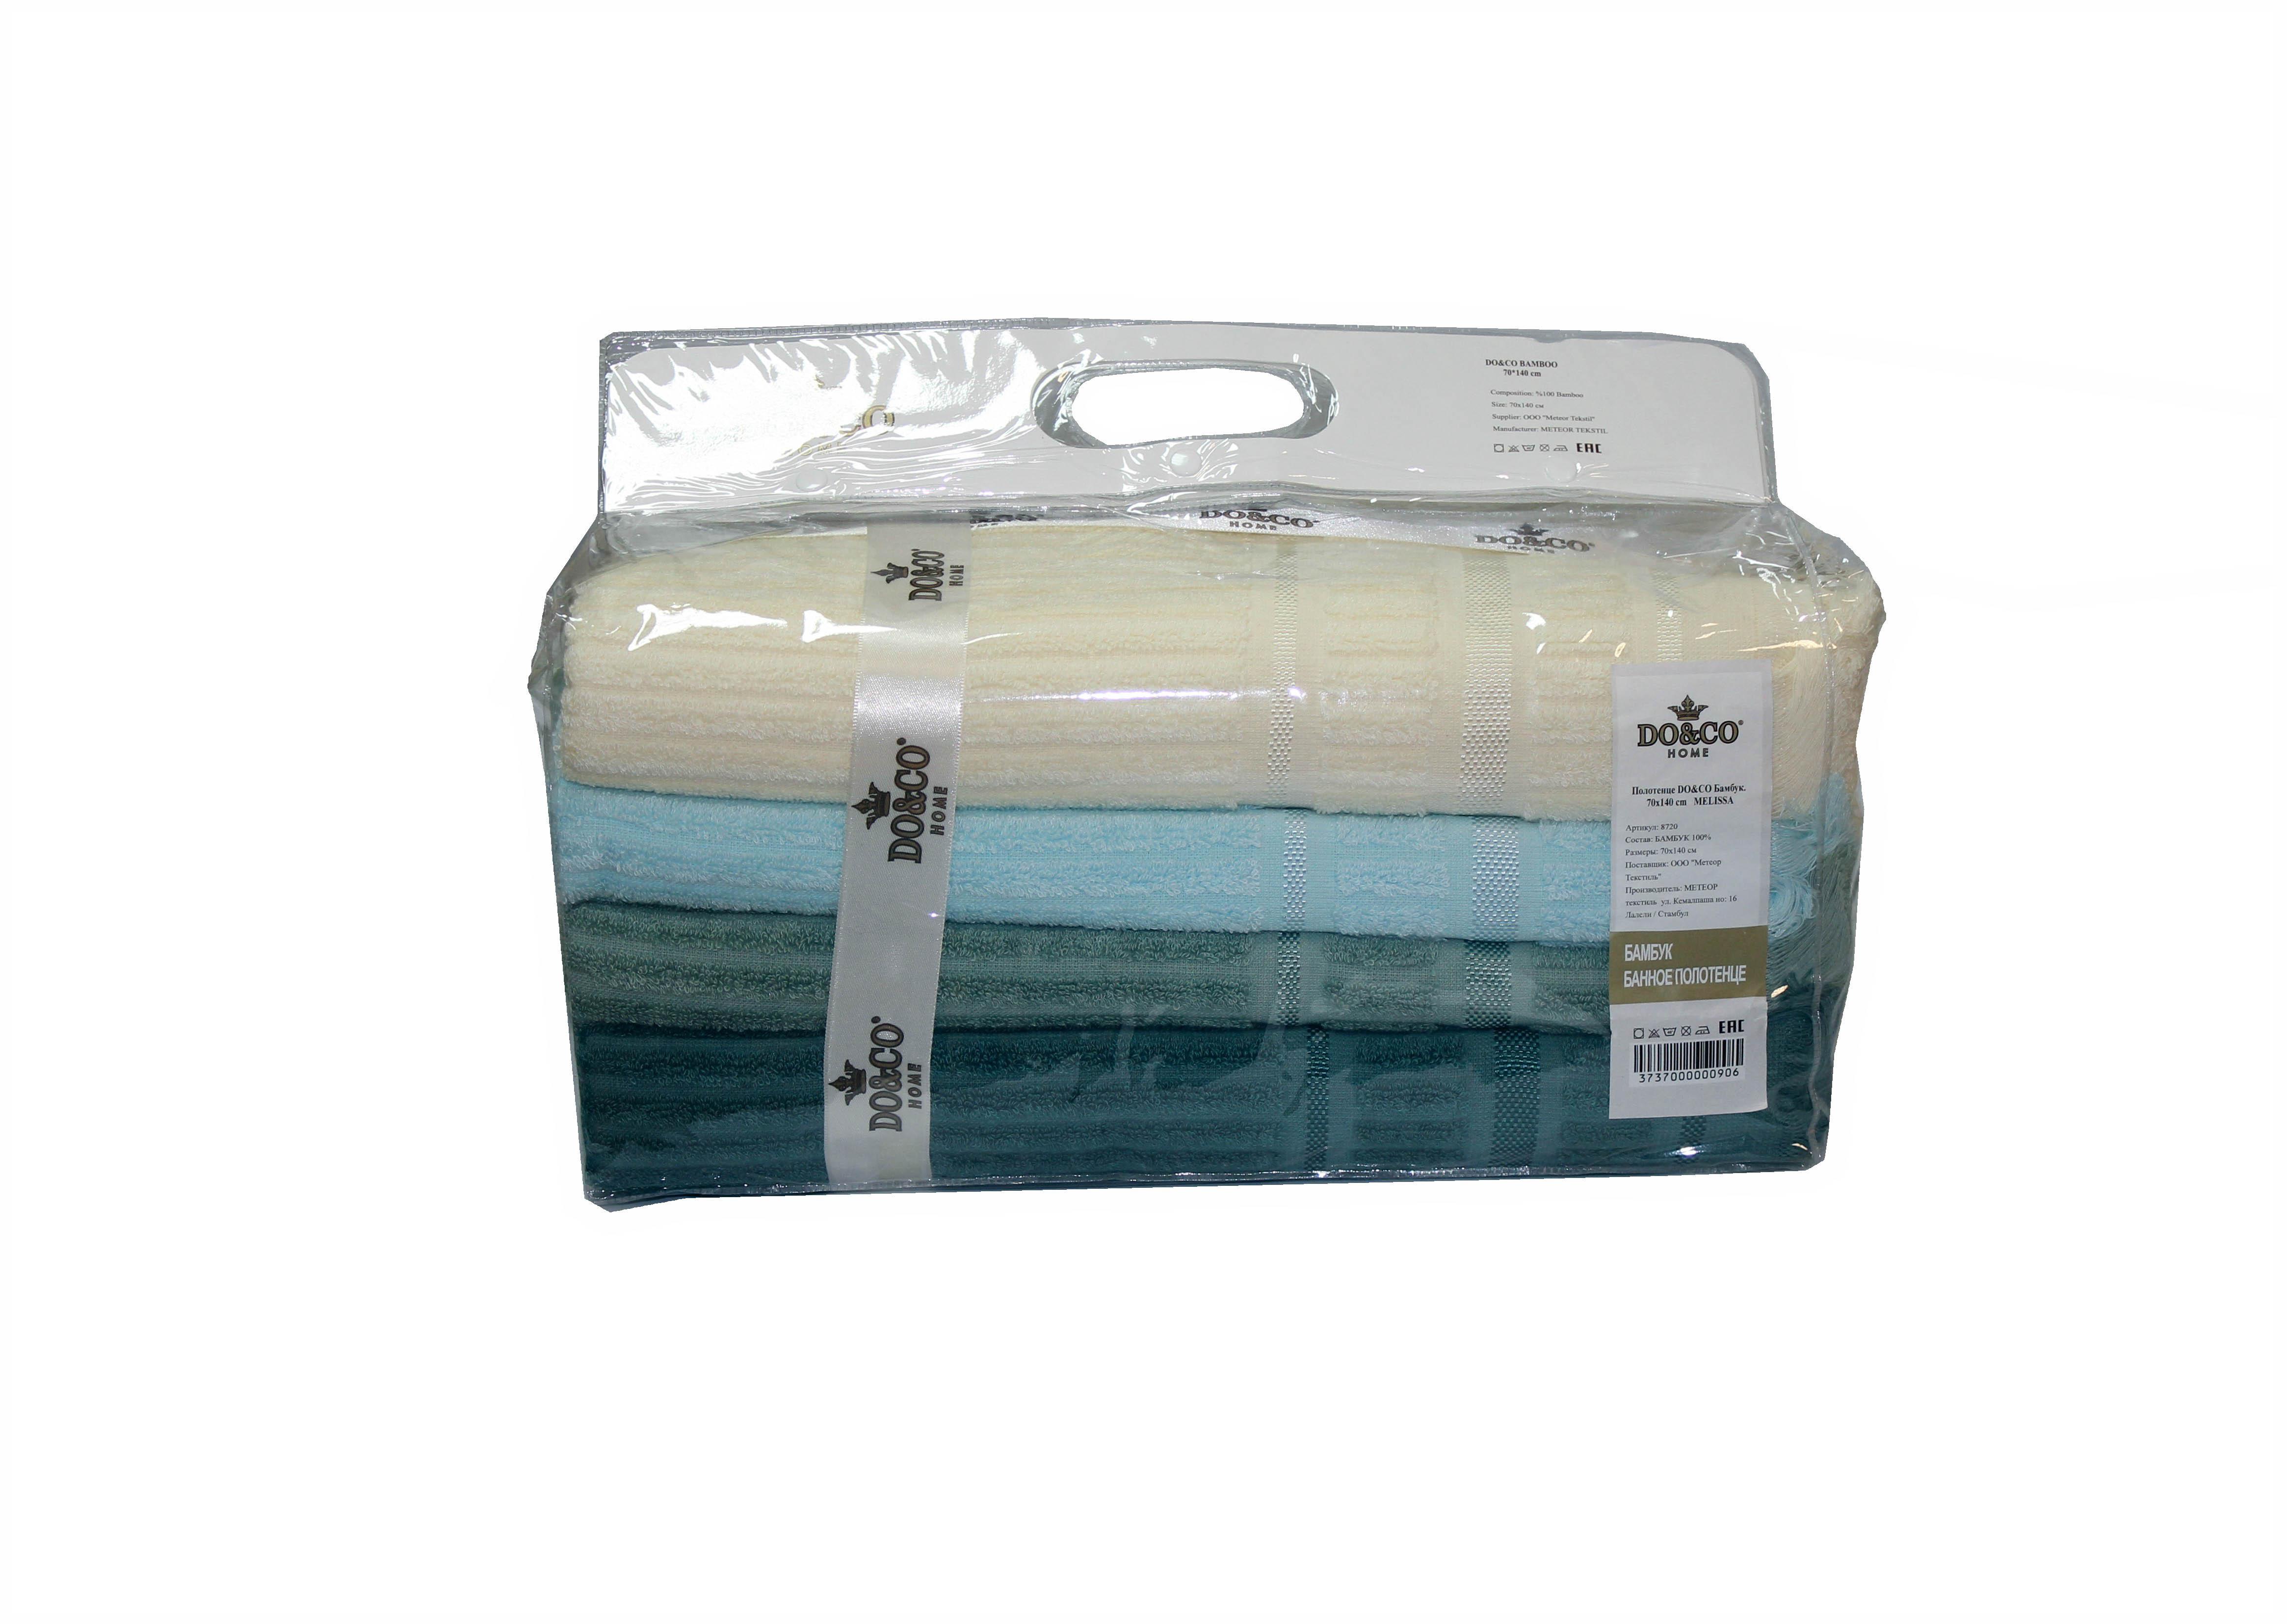 Полотенца DO'n'CO Набор Полотенец Melissa (50х90 см - 4 шт) полотенца кухонные la pastel набор полотенец 4 предмета из микрофибры 30х30